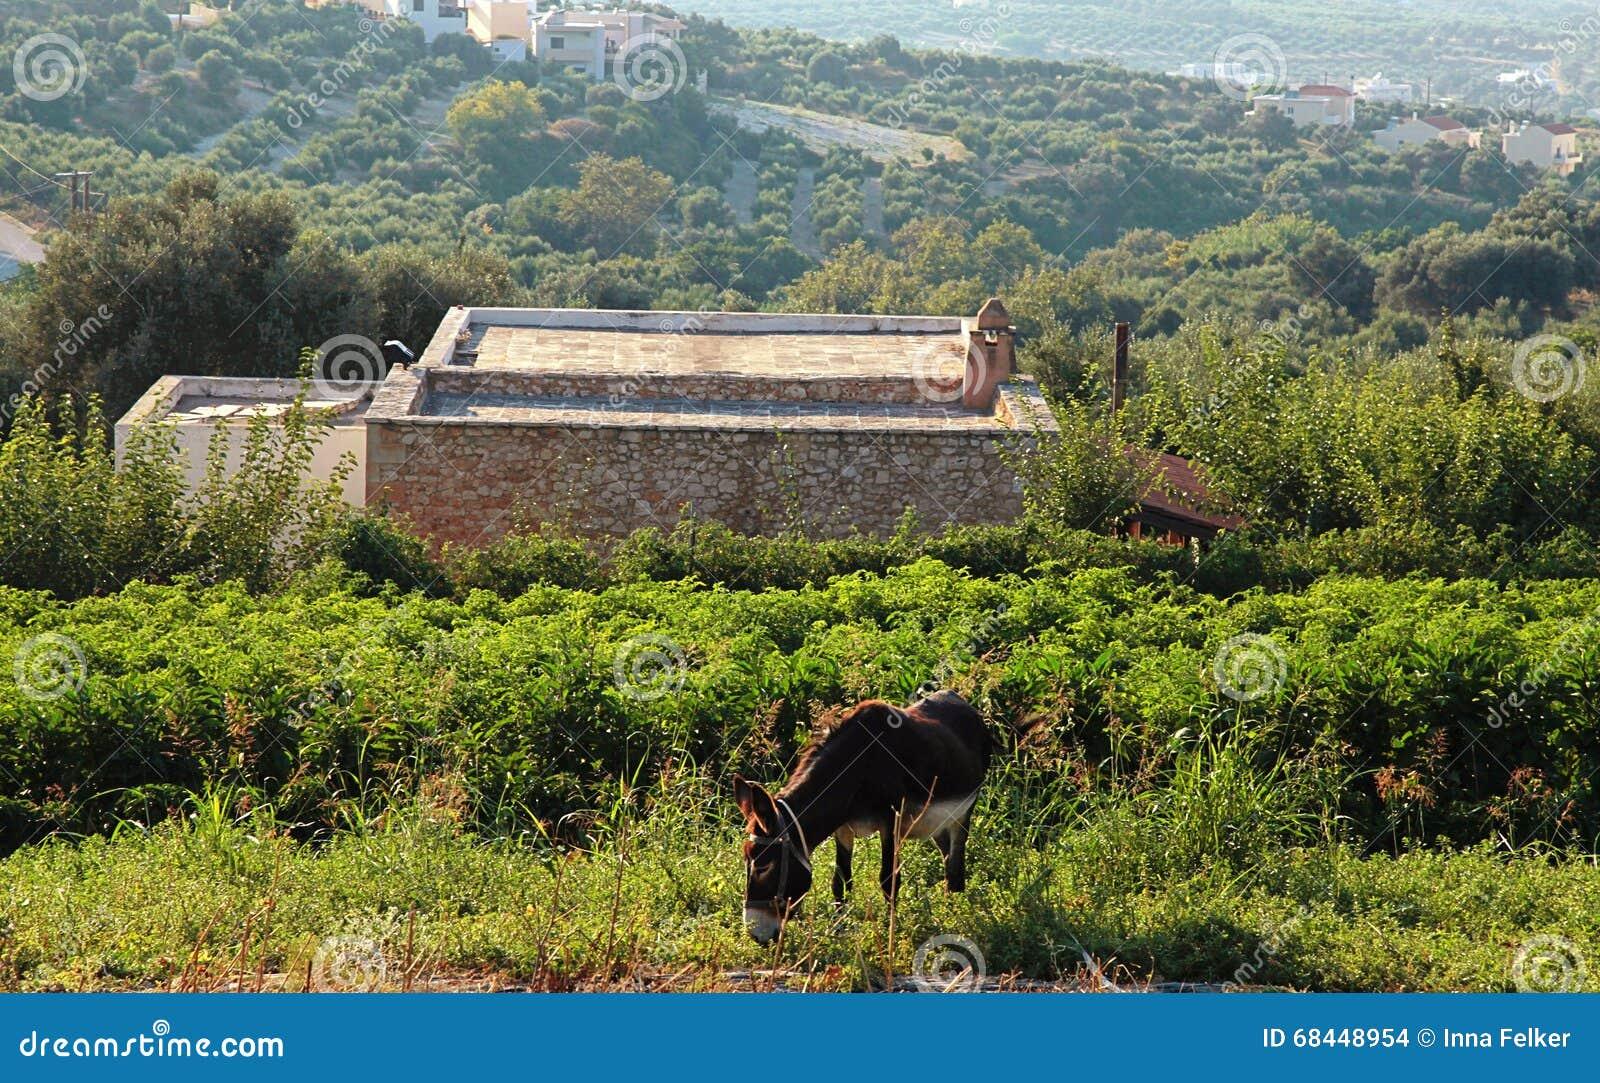 Donkey on countryside landscape, Crete, Greece